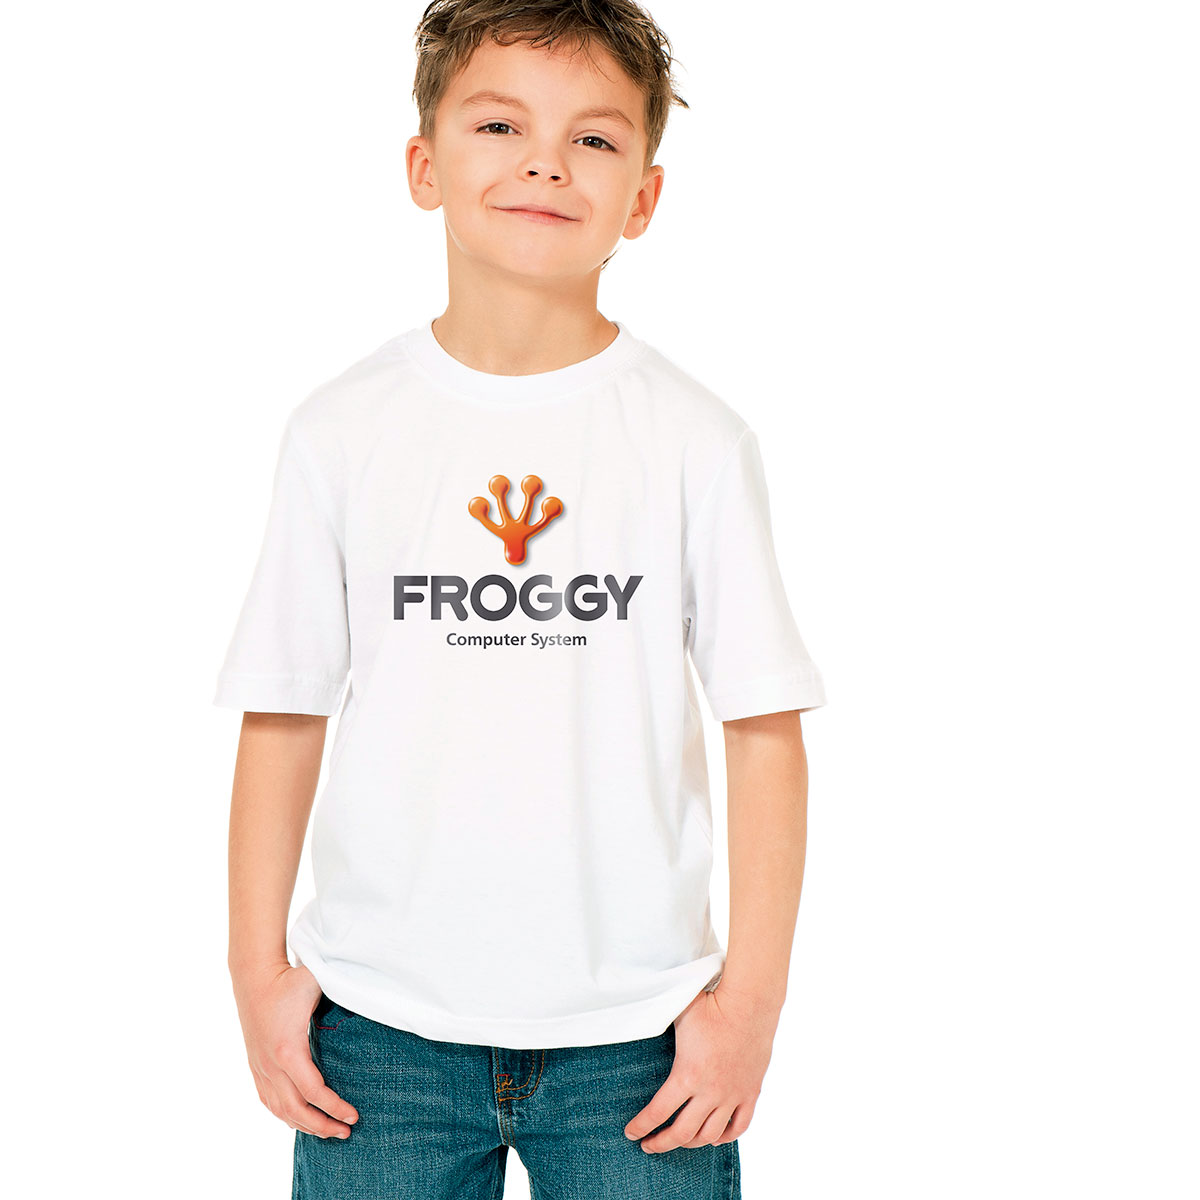 Froggy-shirt.jpg